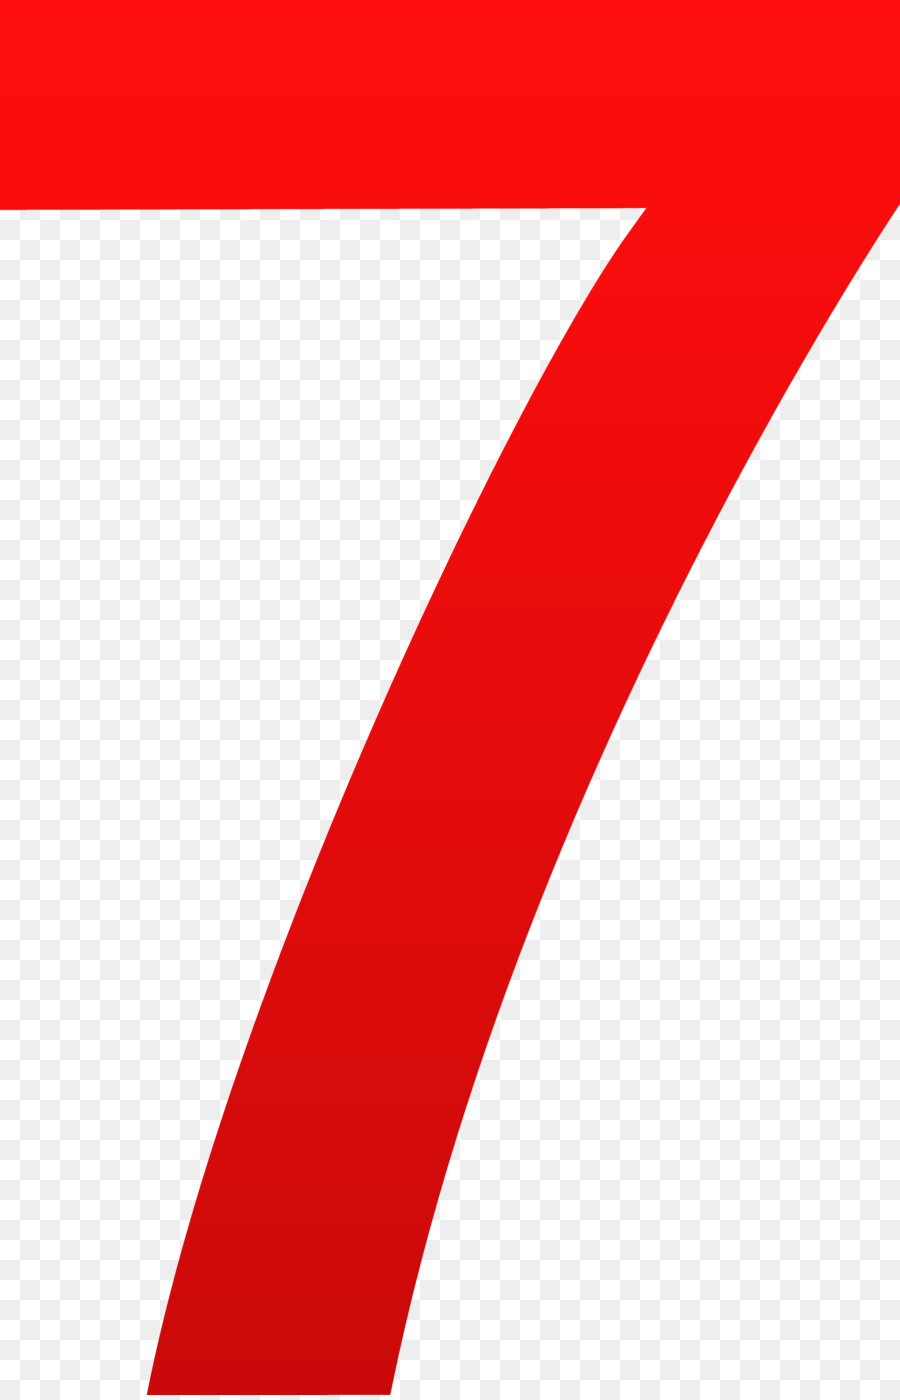 Graphic design area angle. 7 clipart red